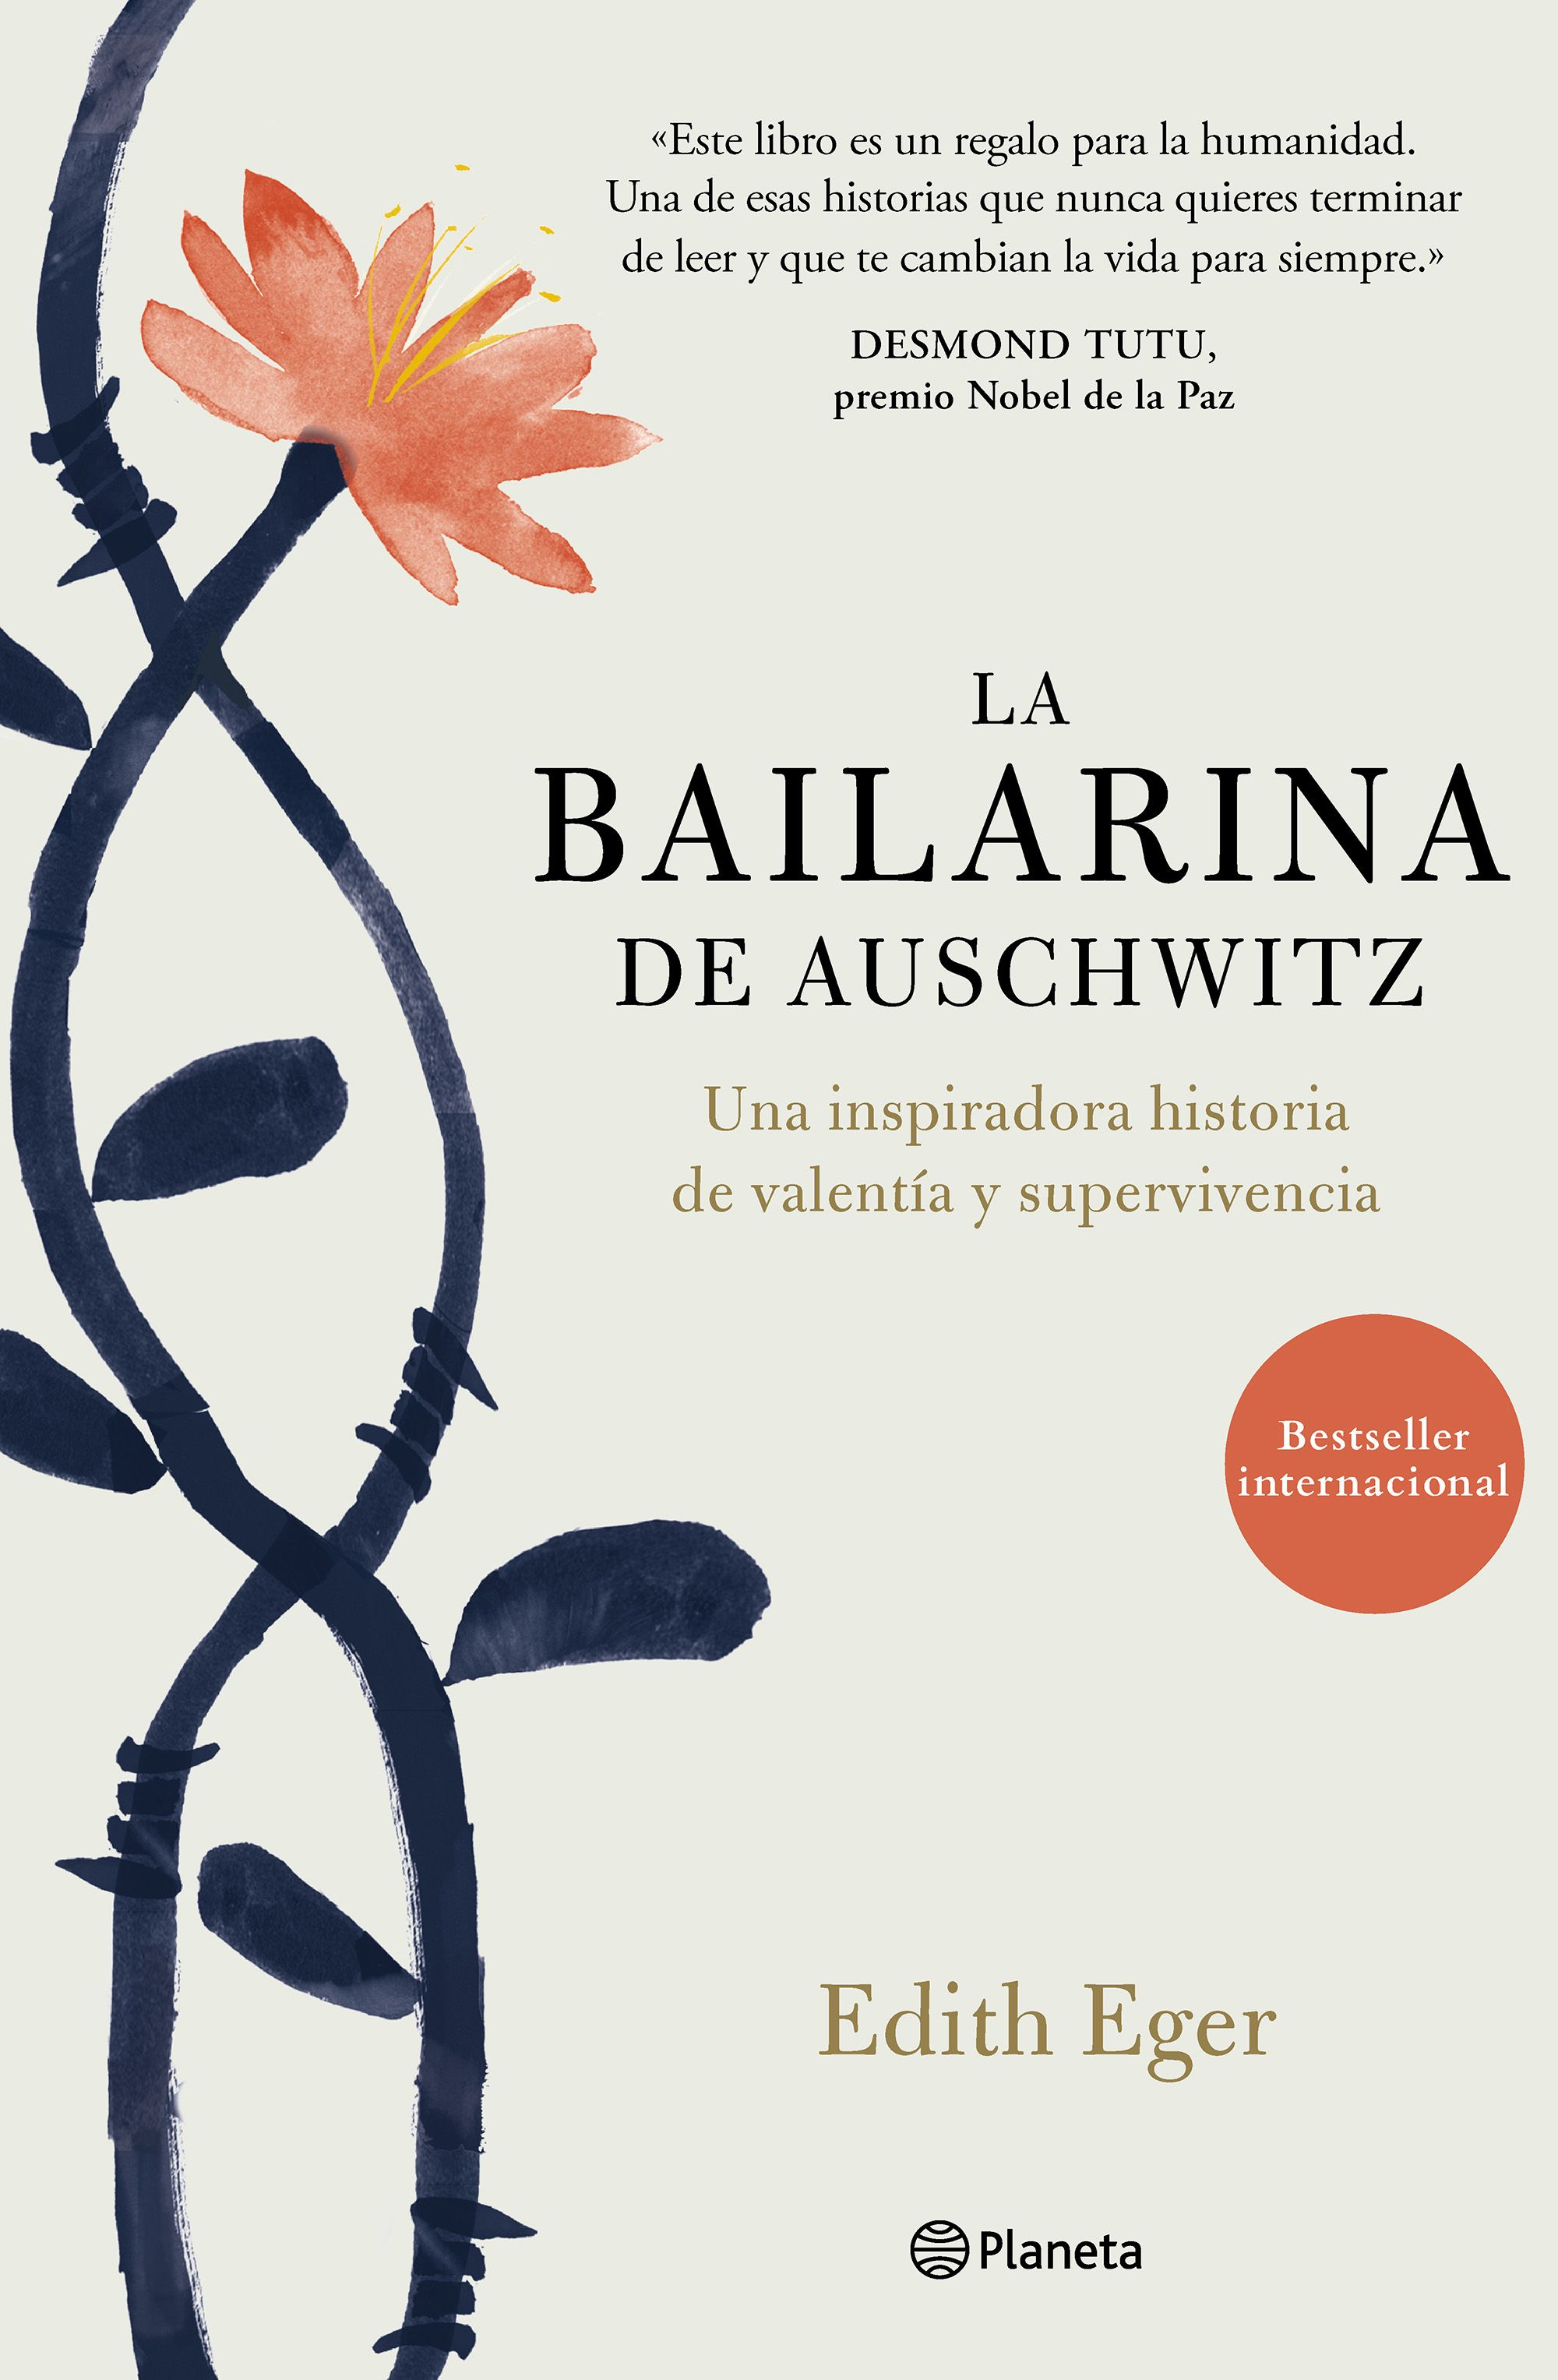 CALENDARIO (R. 2018) Portada_la-bailarina-de-auschwitz_edith-eger_201711291201